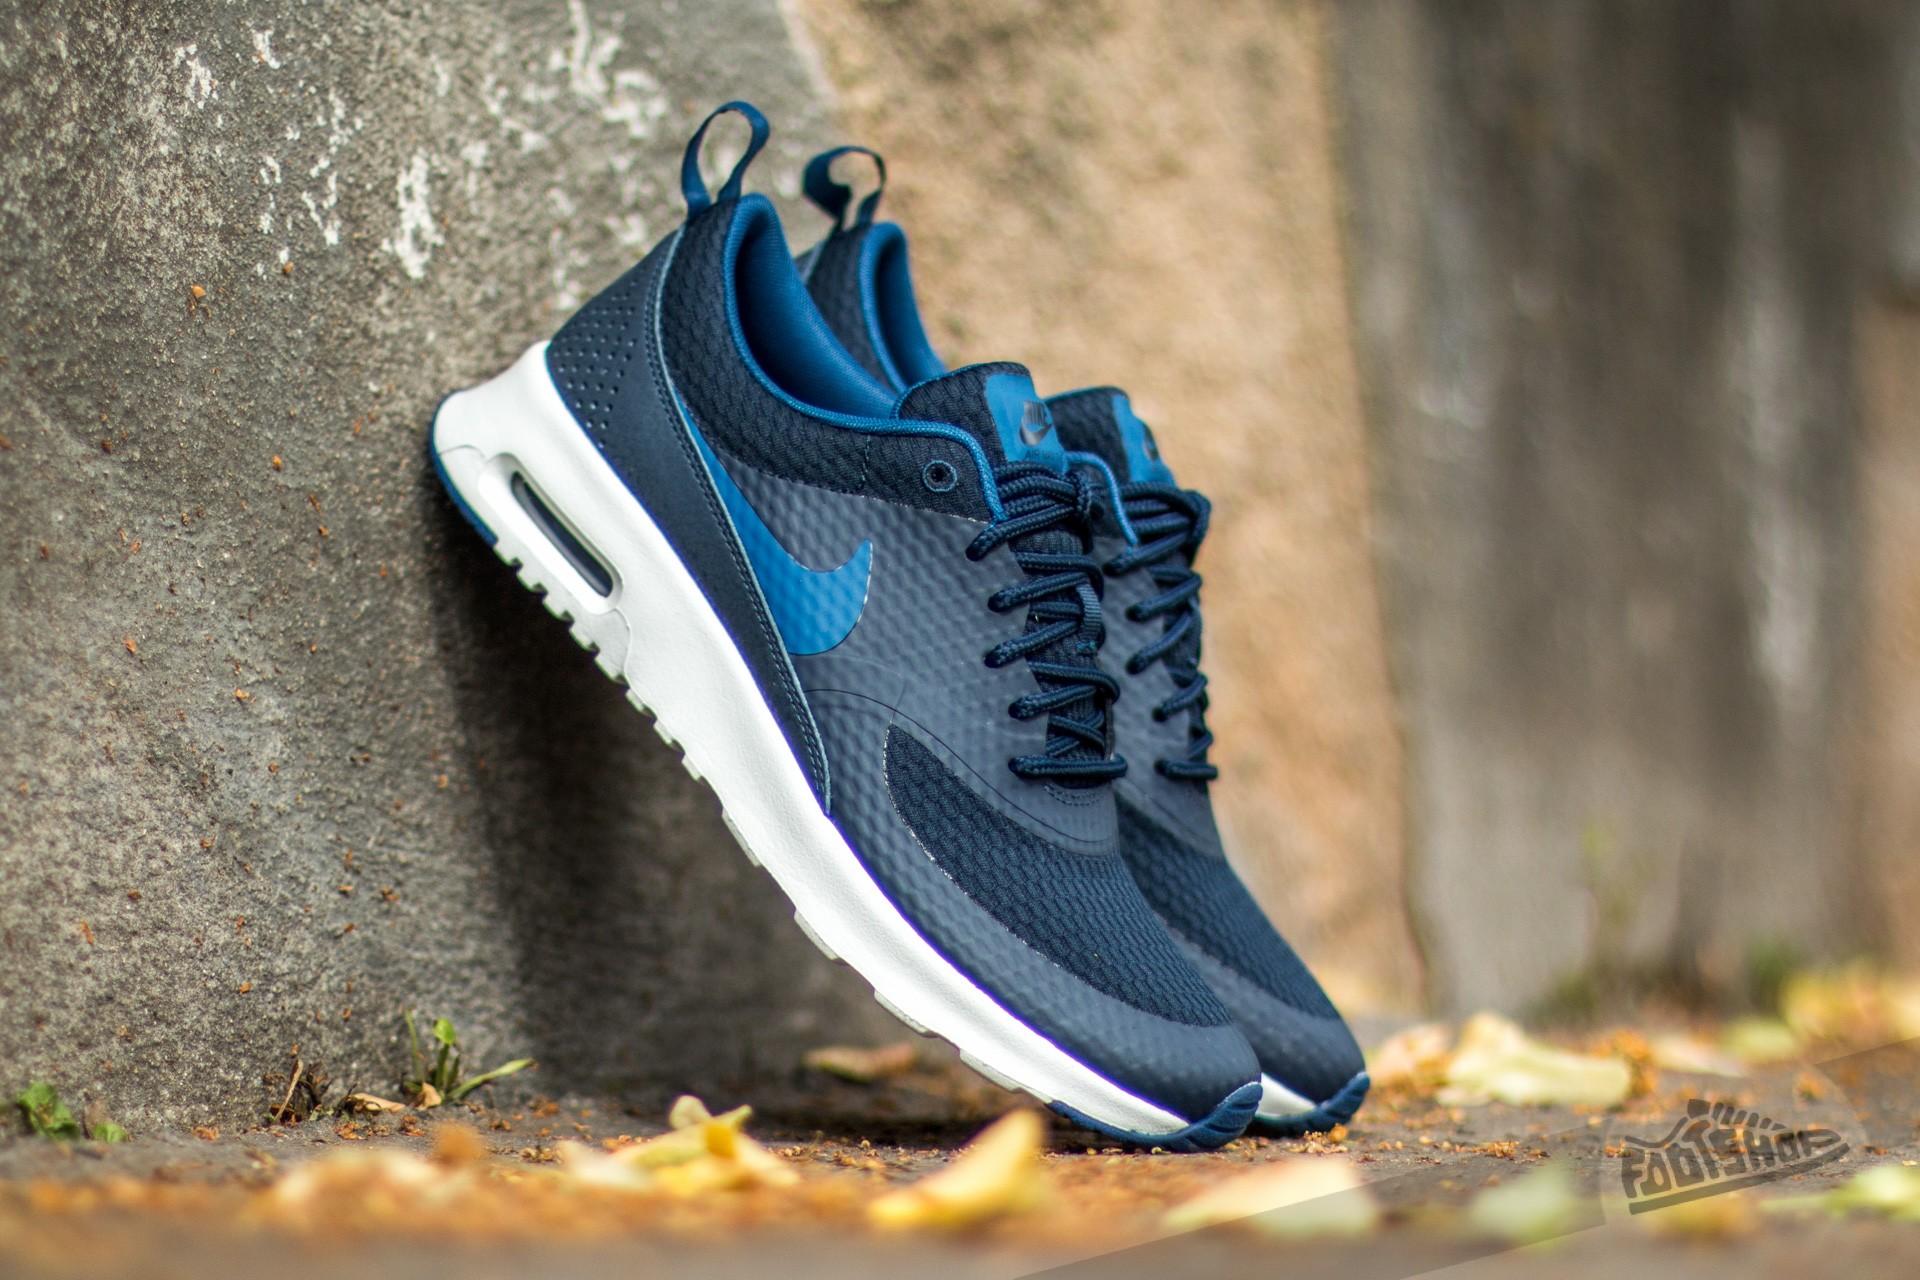 Nike W Air Max Thea TXT Obsidian Coastal Blue Summit White | Footshop